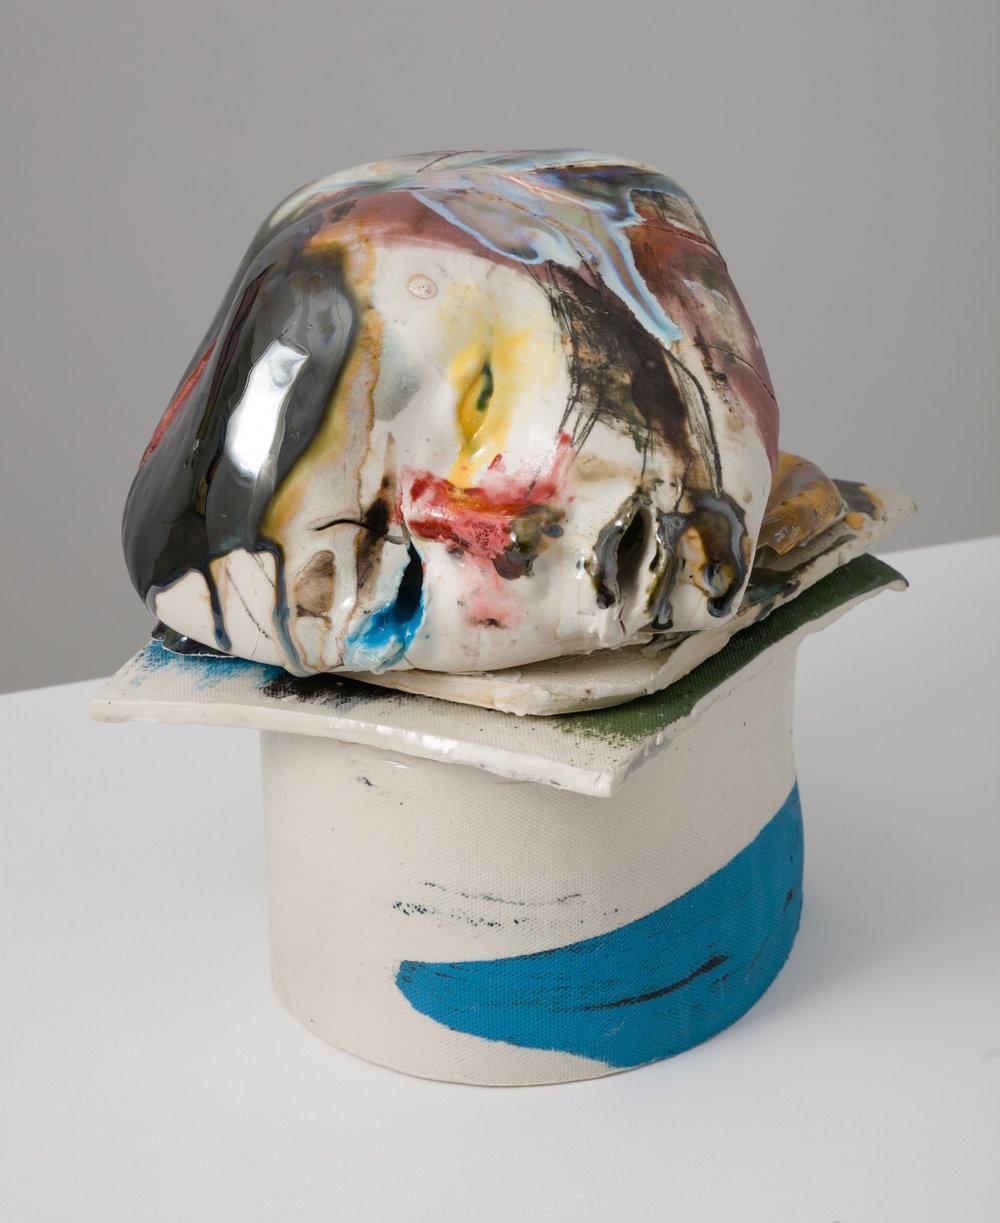 Jennie Jieun Lee, Untitled No. 23, 2016, porcelain slipcast, glaze, underglaze, pencil, 5 x 8 x 9 in.